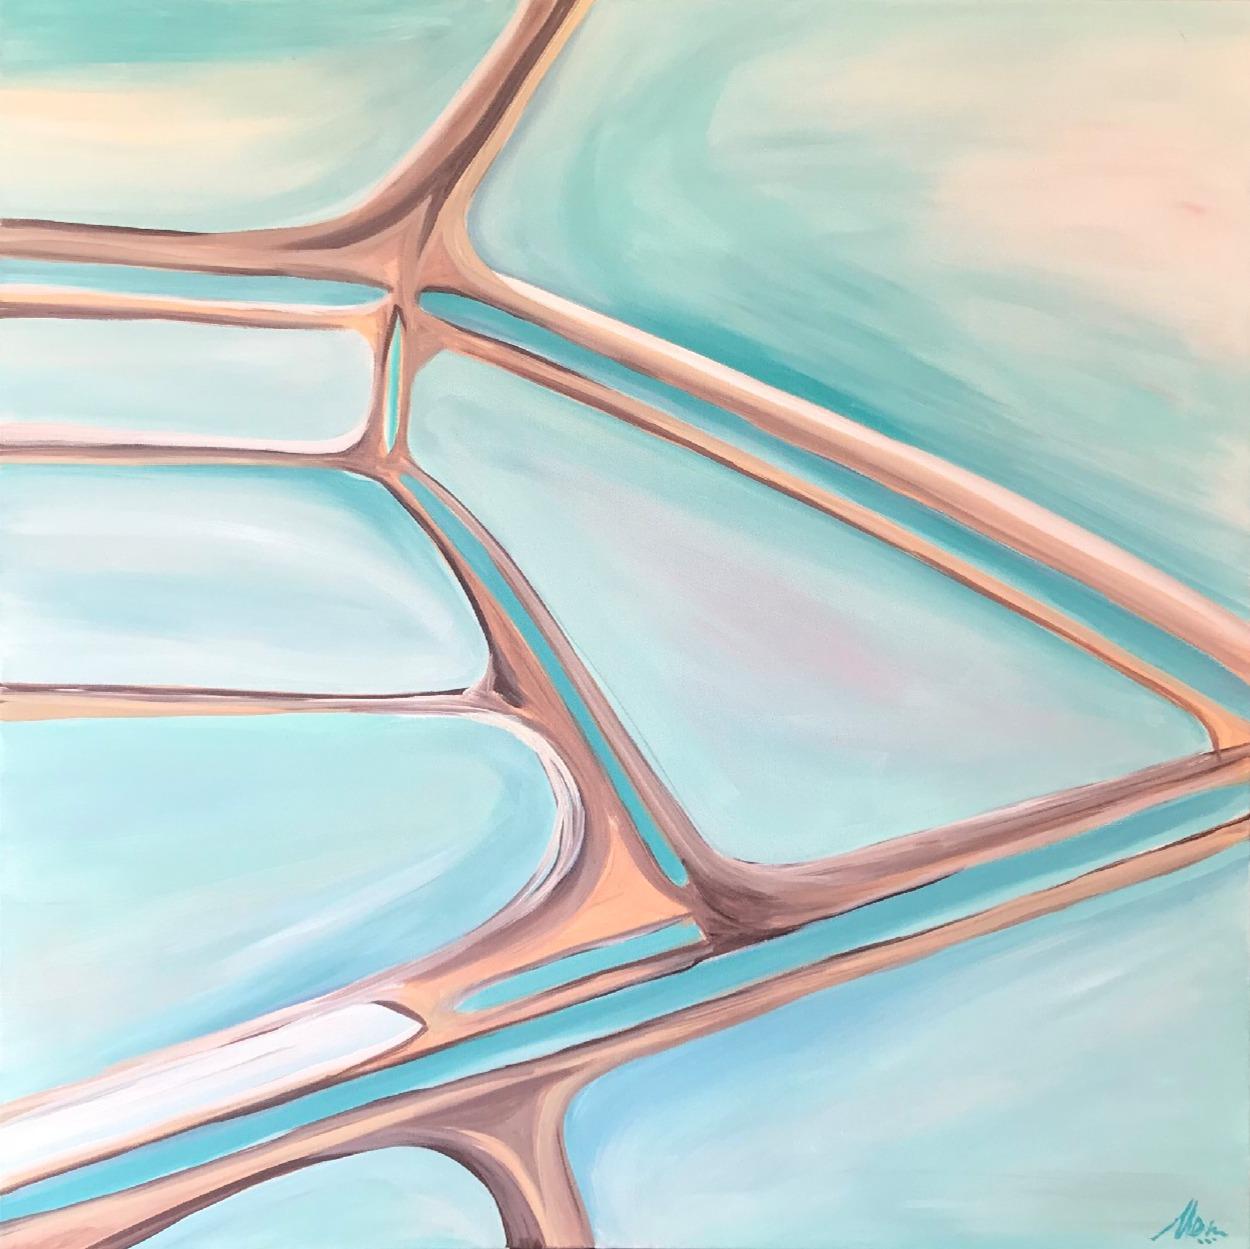 Useless Loop Salt Flats, Shark Bay WA – The Salt Series